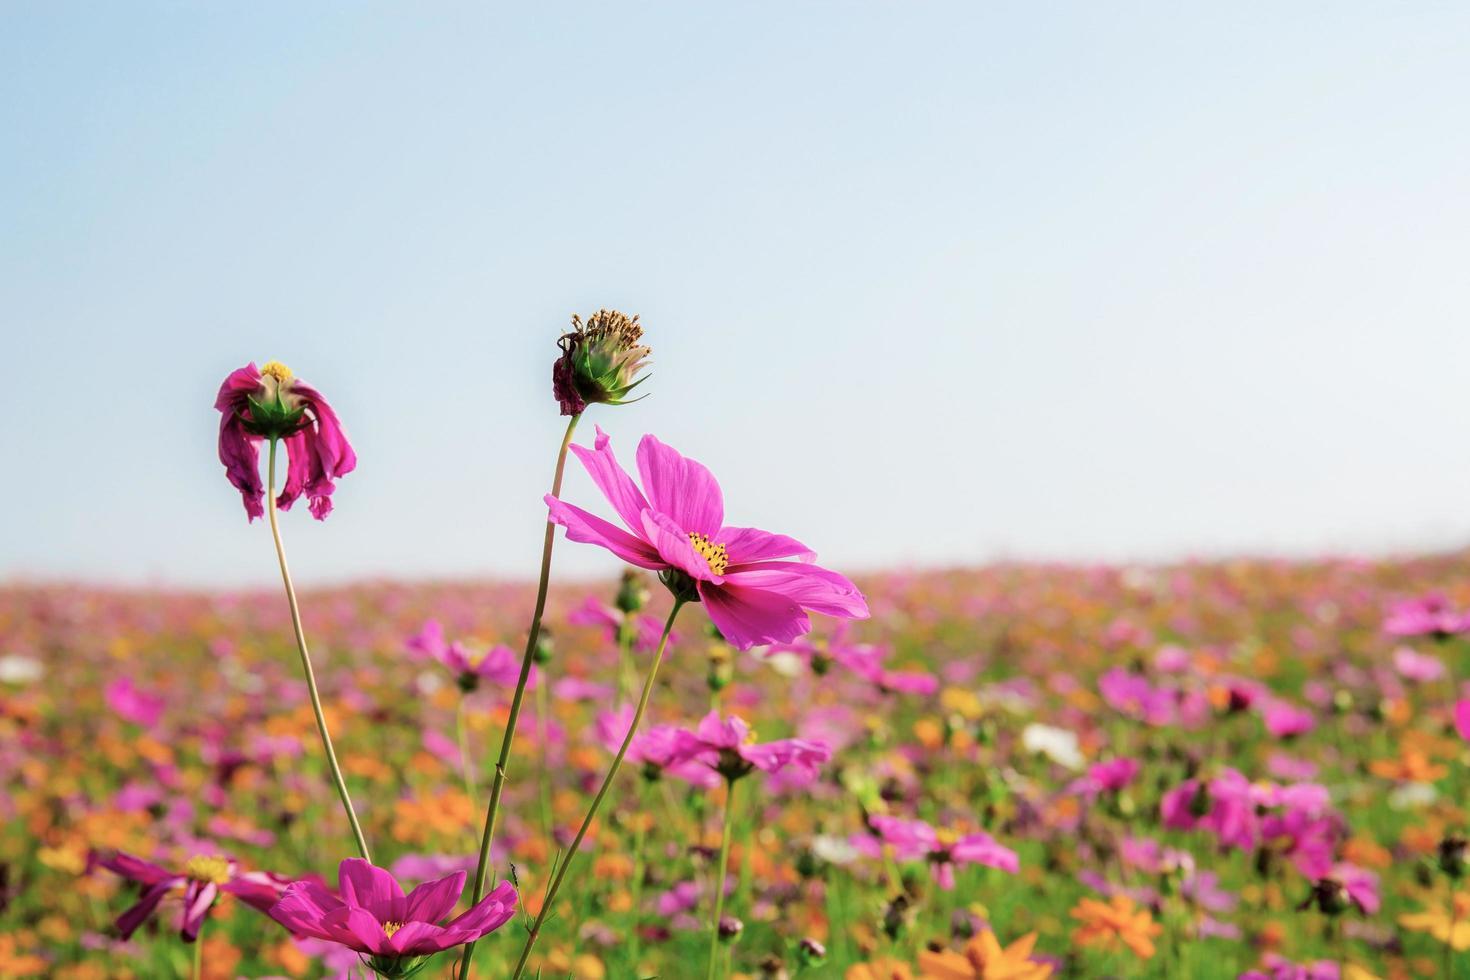 Pink cosmos flower in field photo